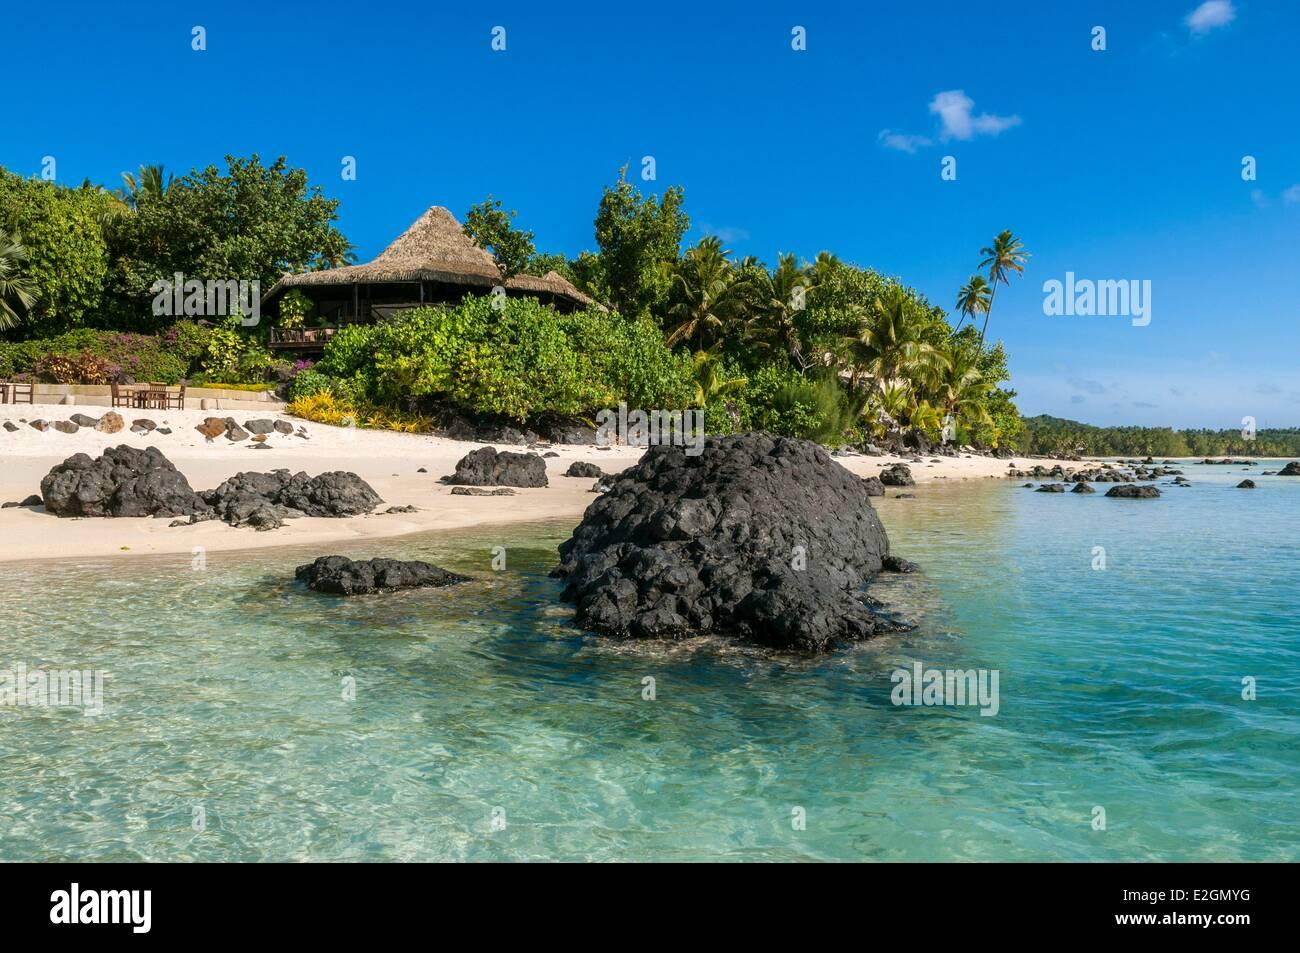 Cook Islands Aitutaki Island Pacific Resort labelled Smal Luxury Hotel of World - Stock Image